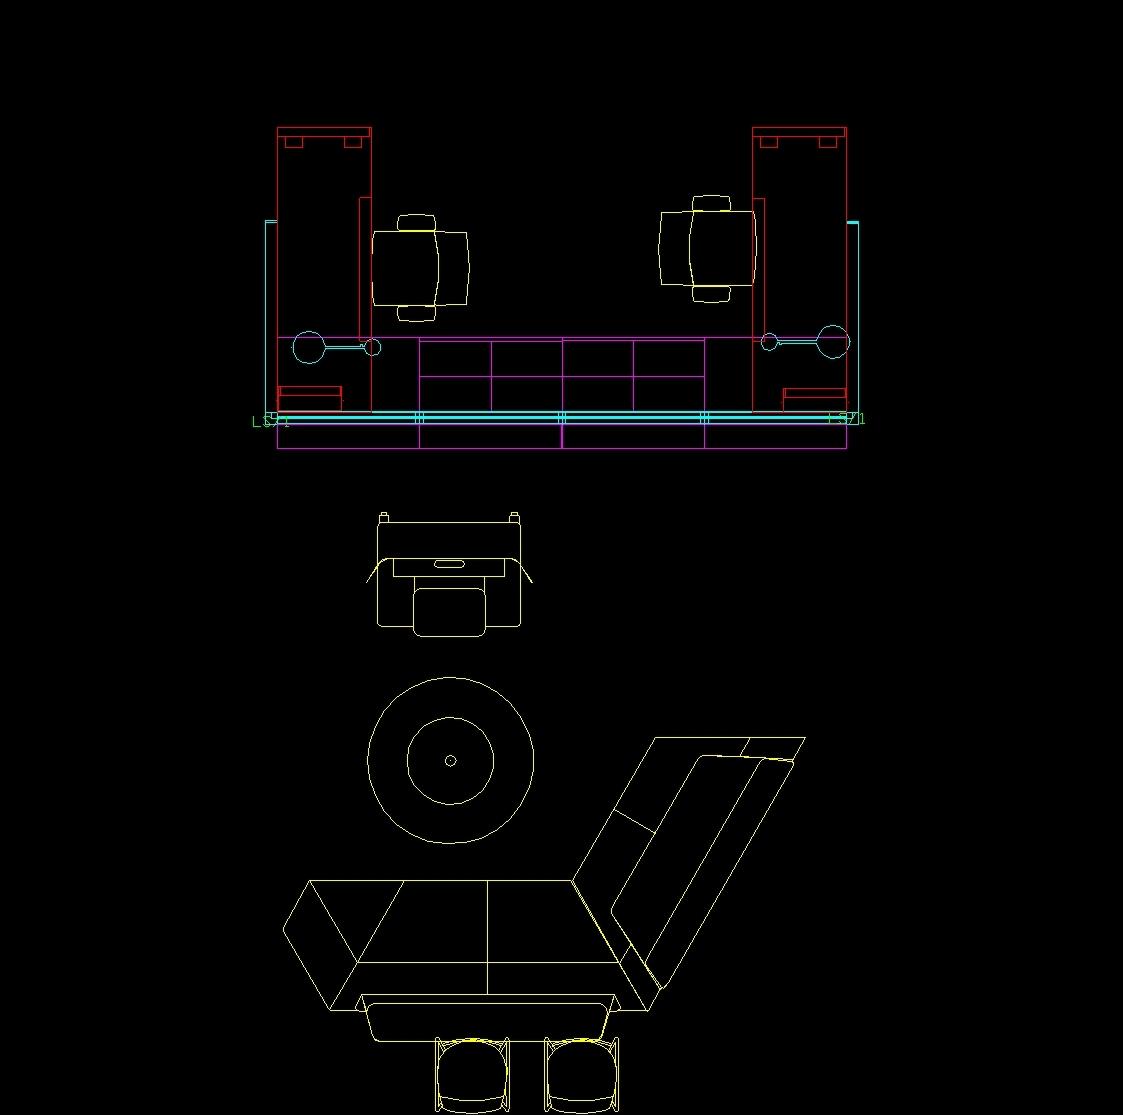 Steel Case Furniture Dwg Block For Autocad Designs Cad